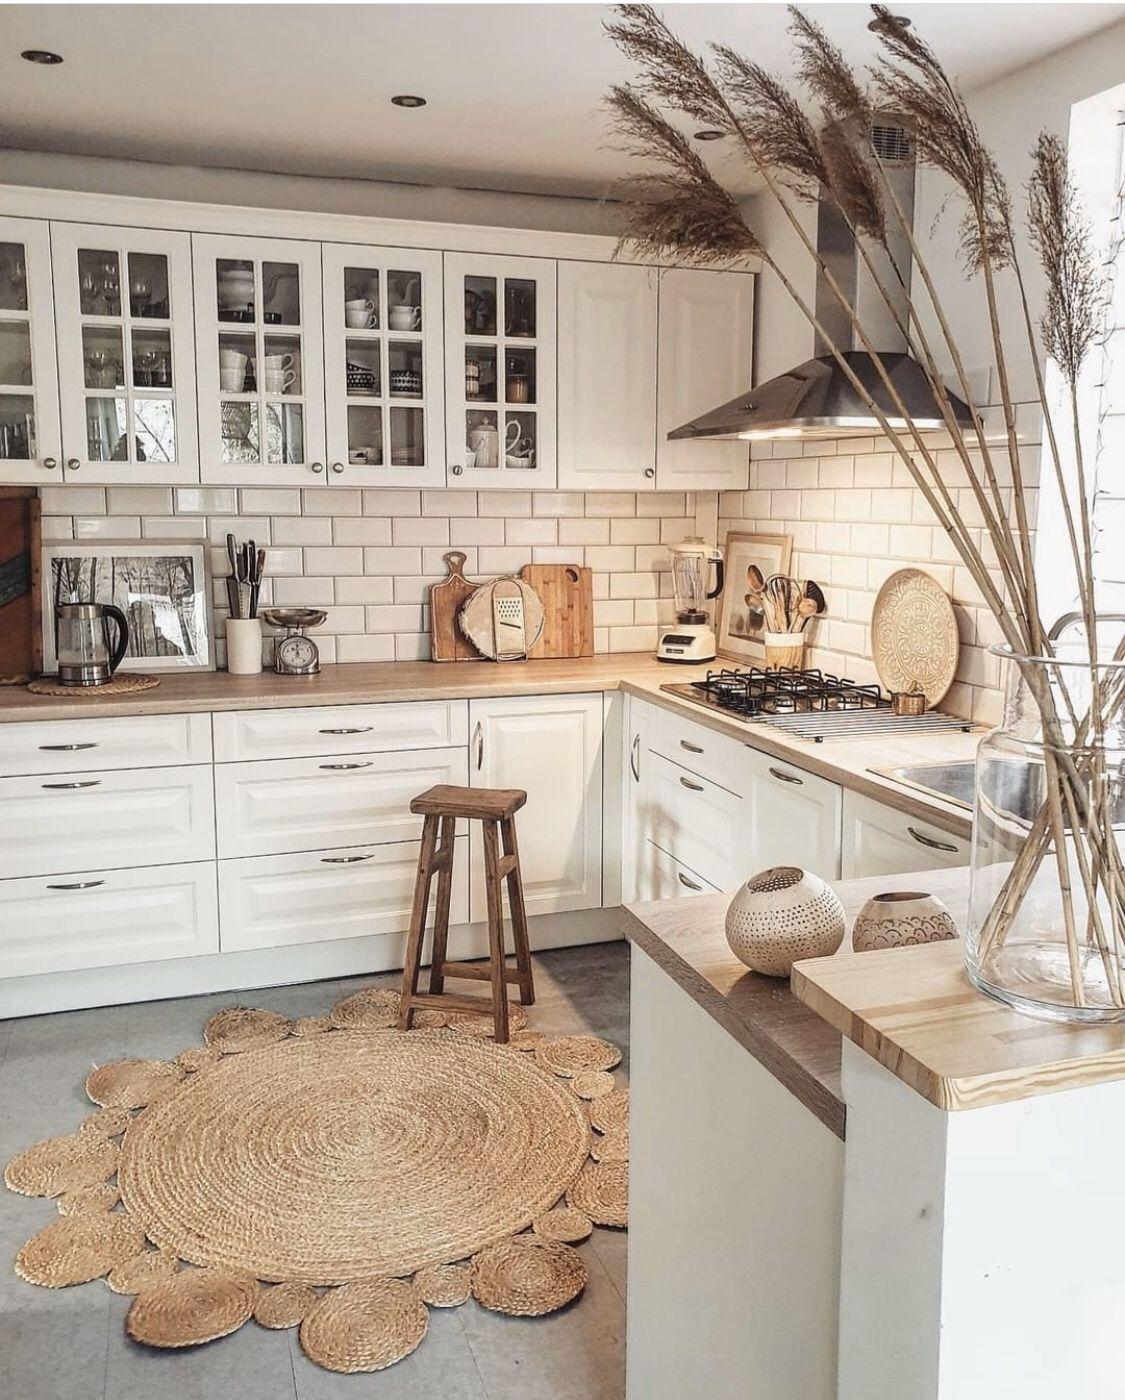 32 Great Tik Tok Video For Home Decor   Classy kitchen, Stylish ...